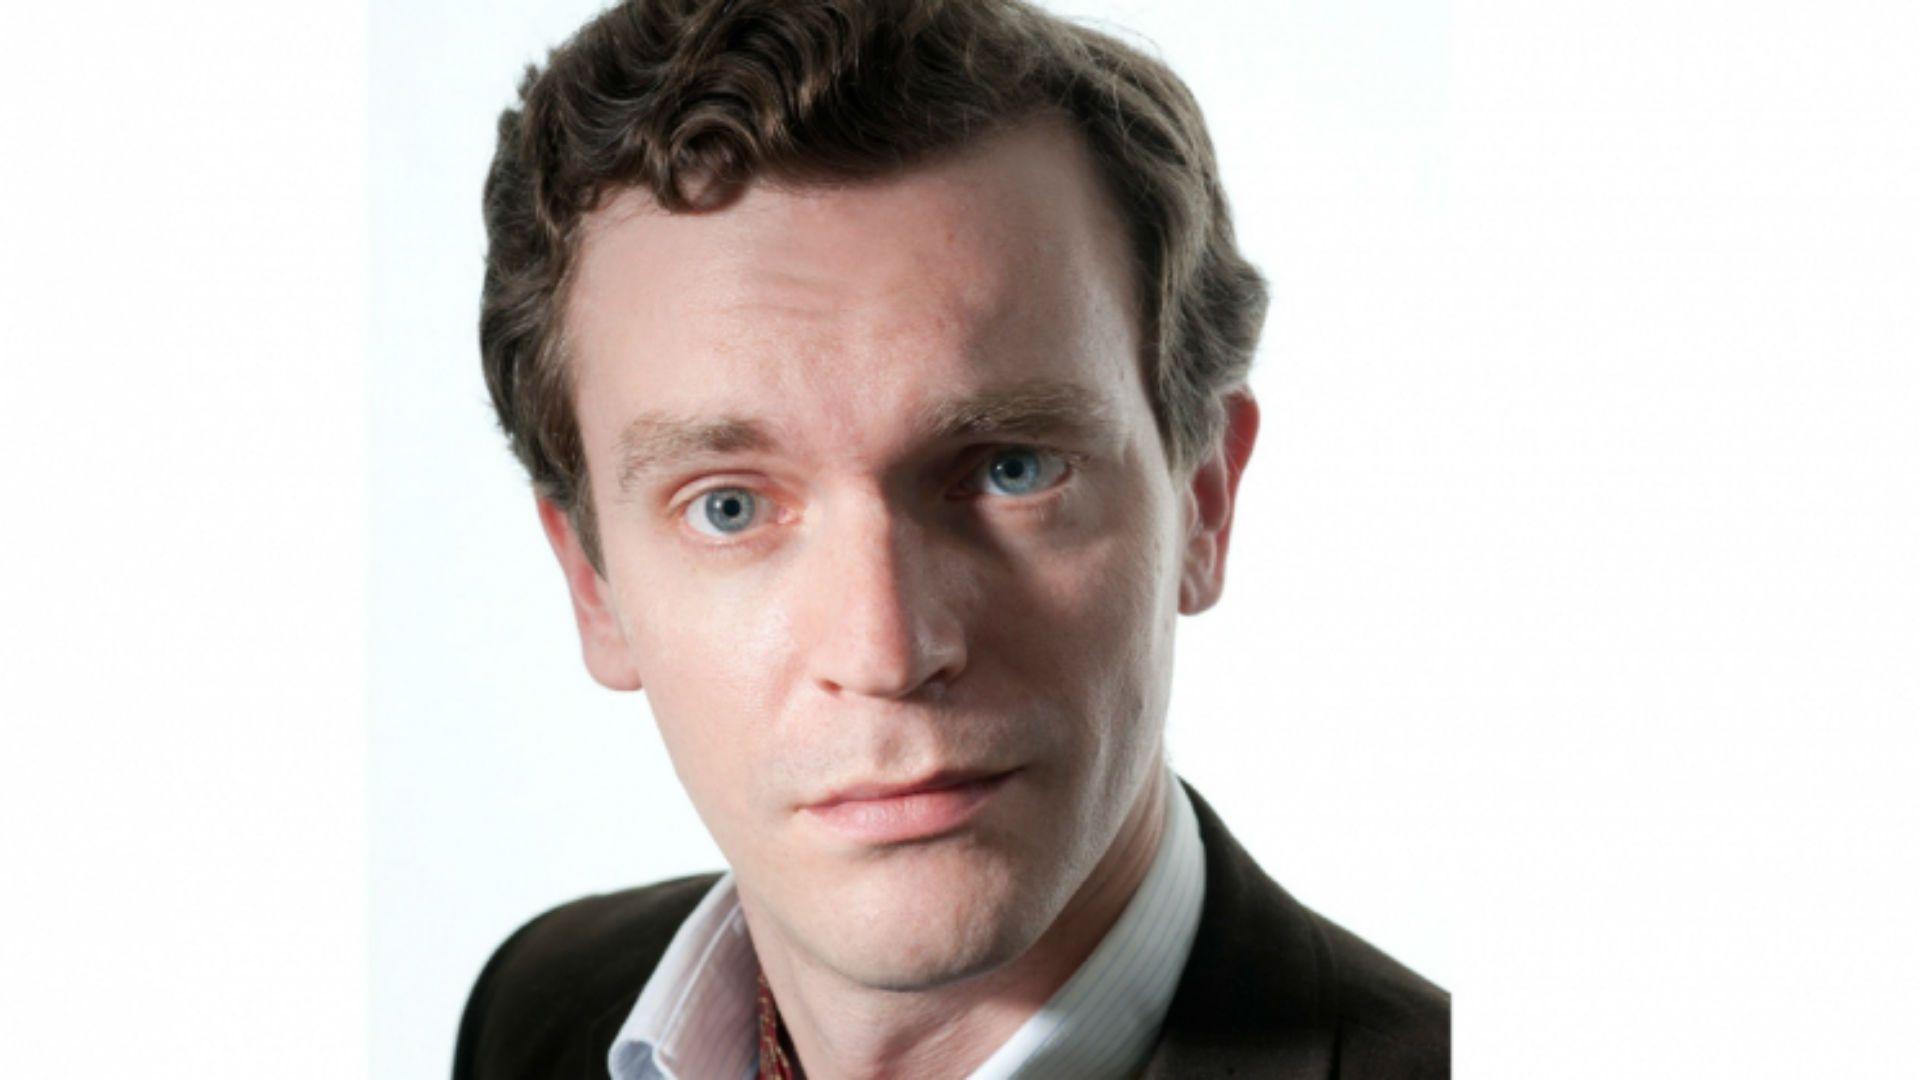 El lingüista británico Mark Forsyth